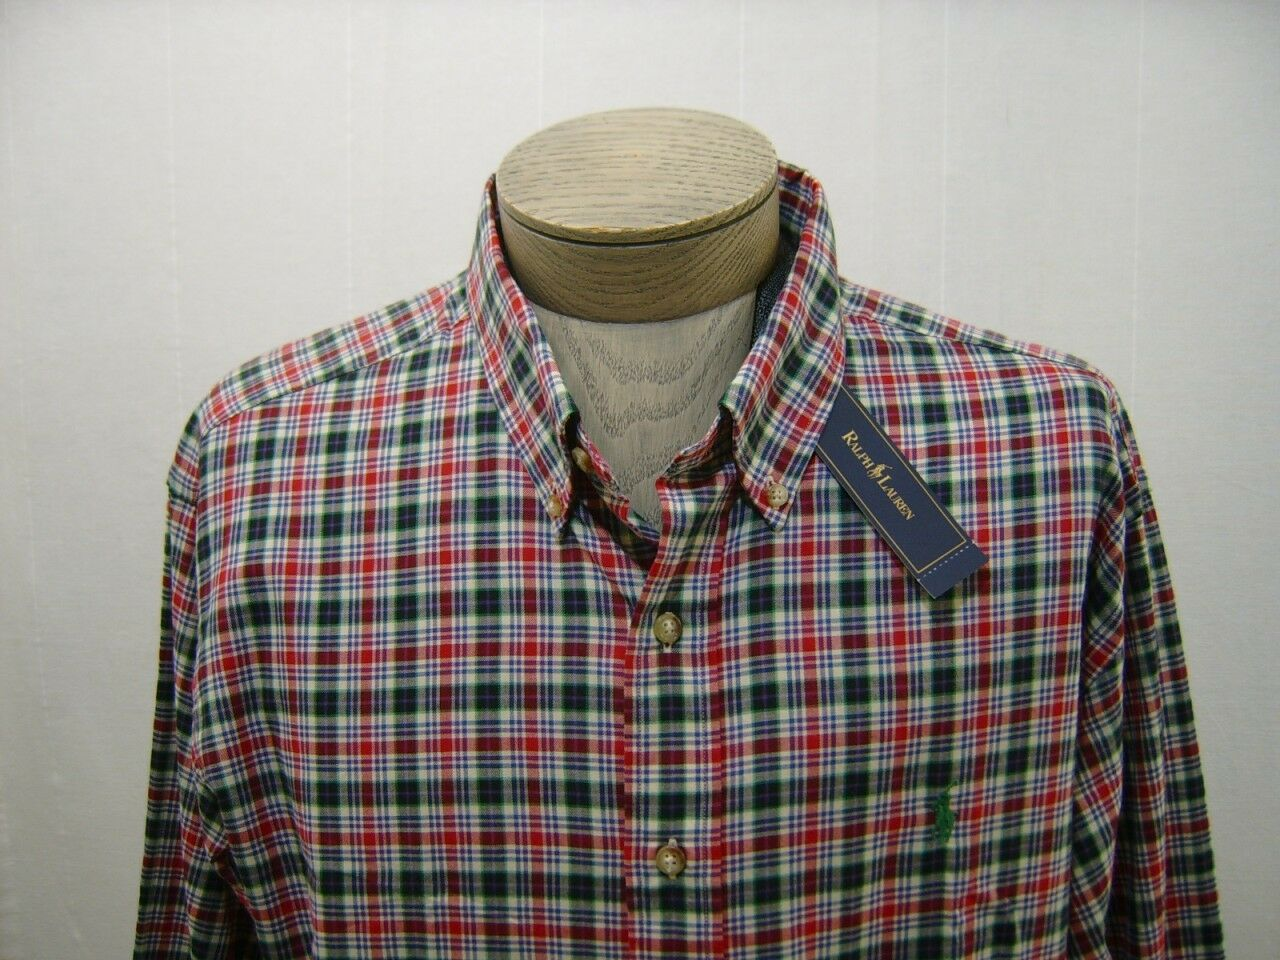 2XLT Tall Polo Ralph Lauren Mens Pony Shirt Red Navy Green Button Down Up Madras